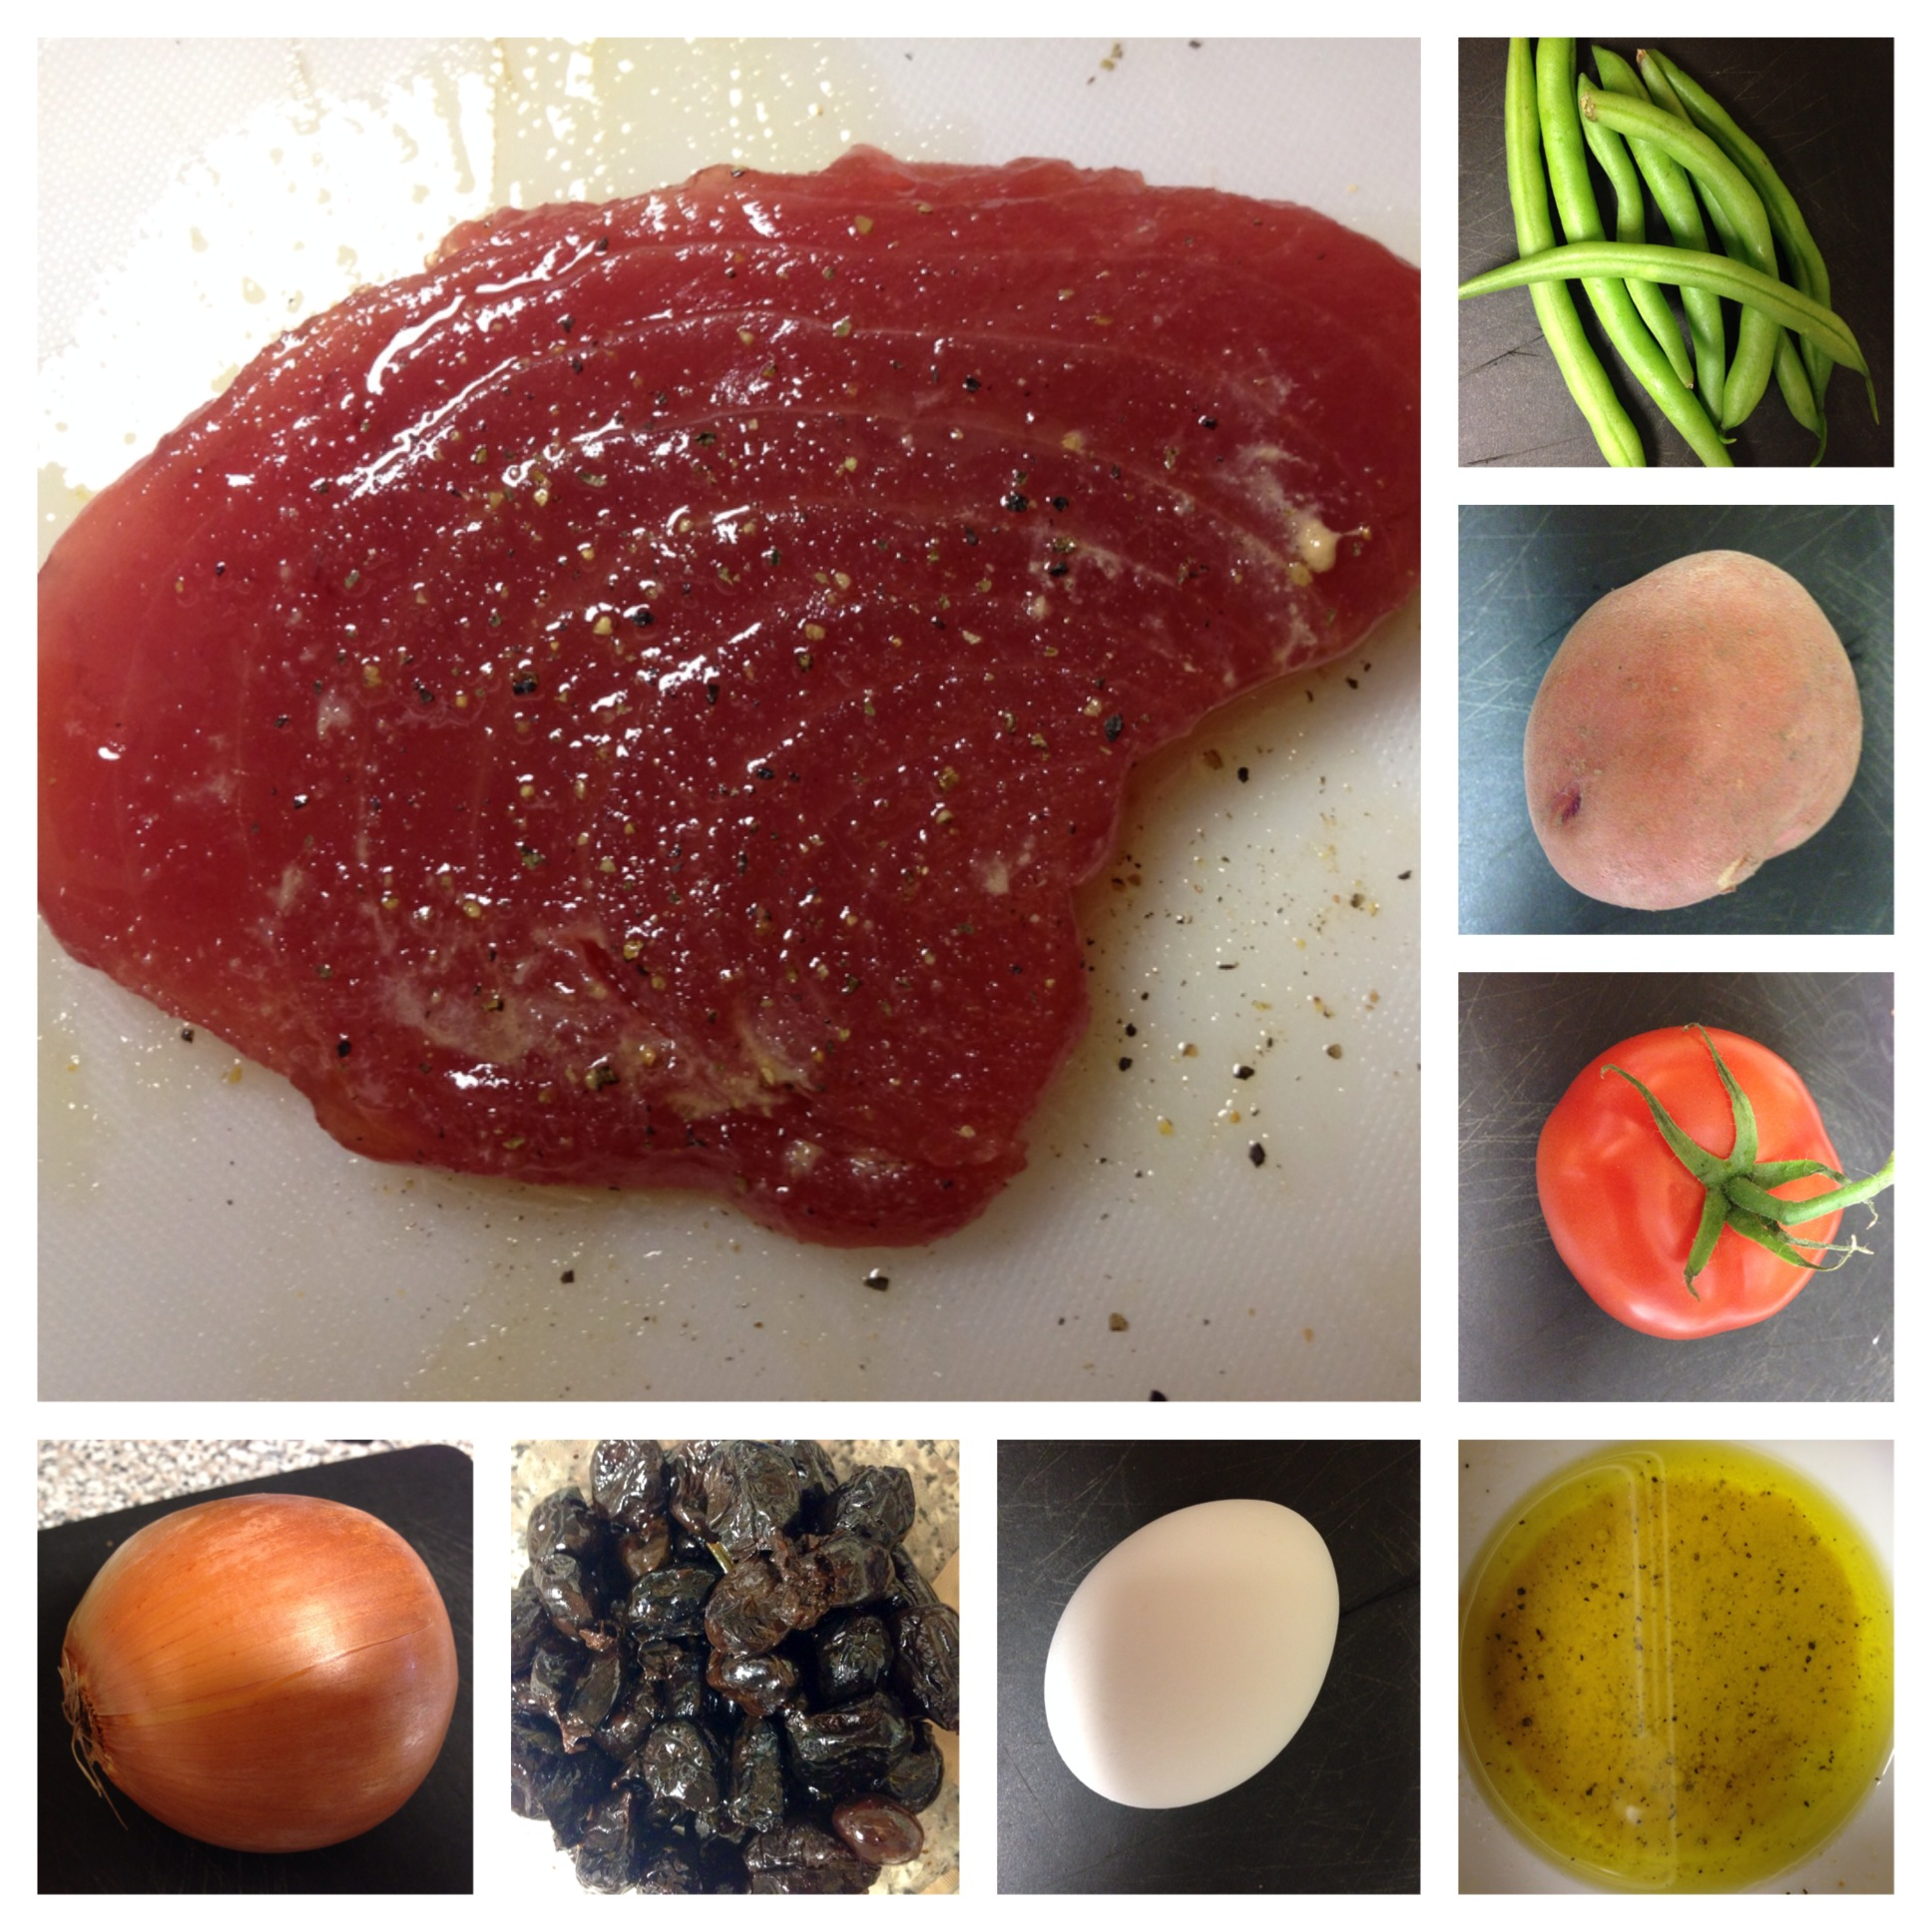 hard boiled egg 1 sliced ripe red tomato 1 red potato 1 small onion ...